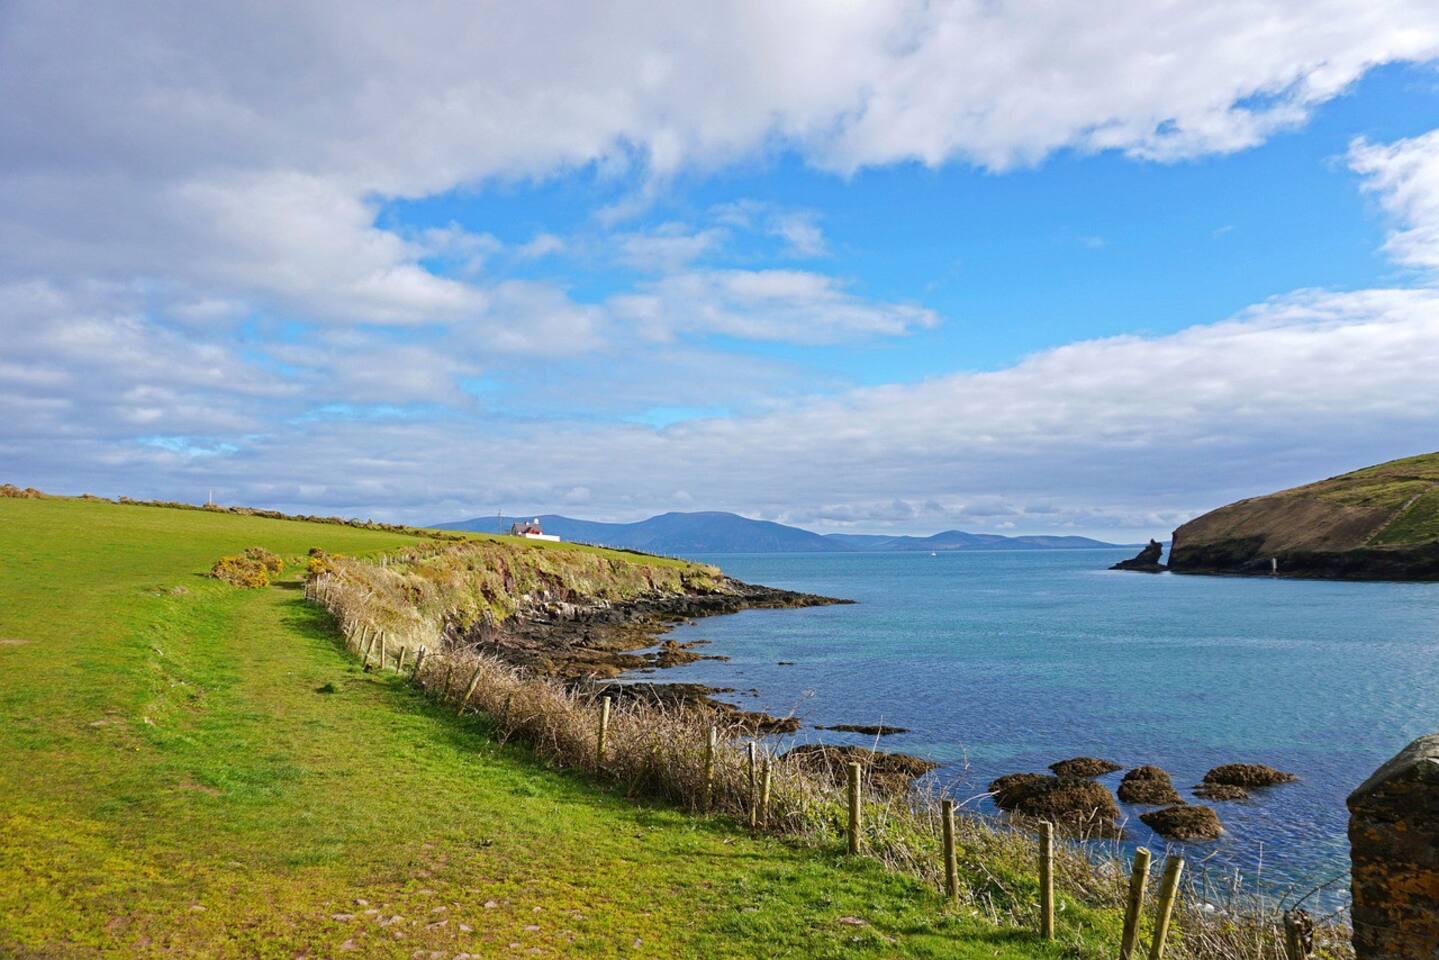 Walk along Dingle harbour to the lighthouse, Slaudeen beach & see Fungi, the Dingle Dolphin